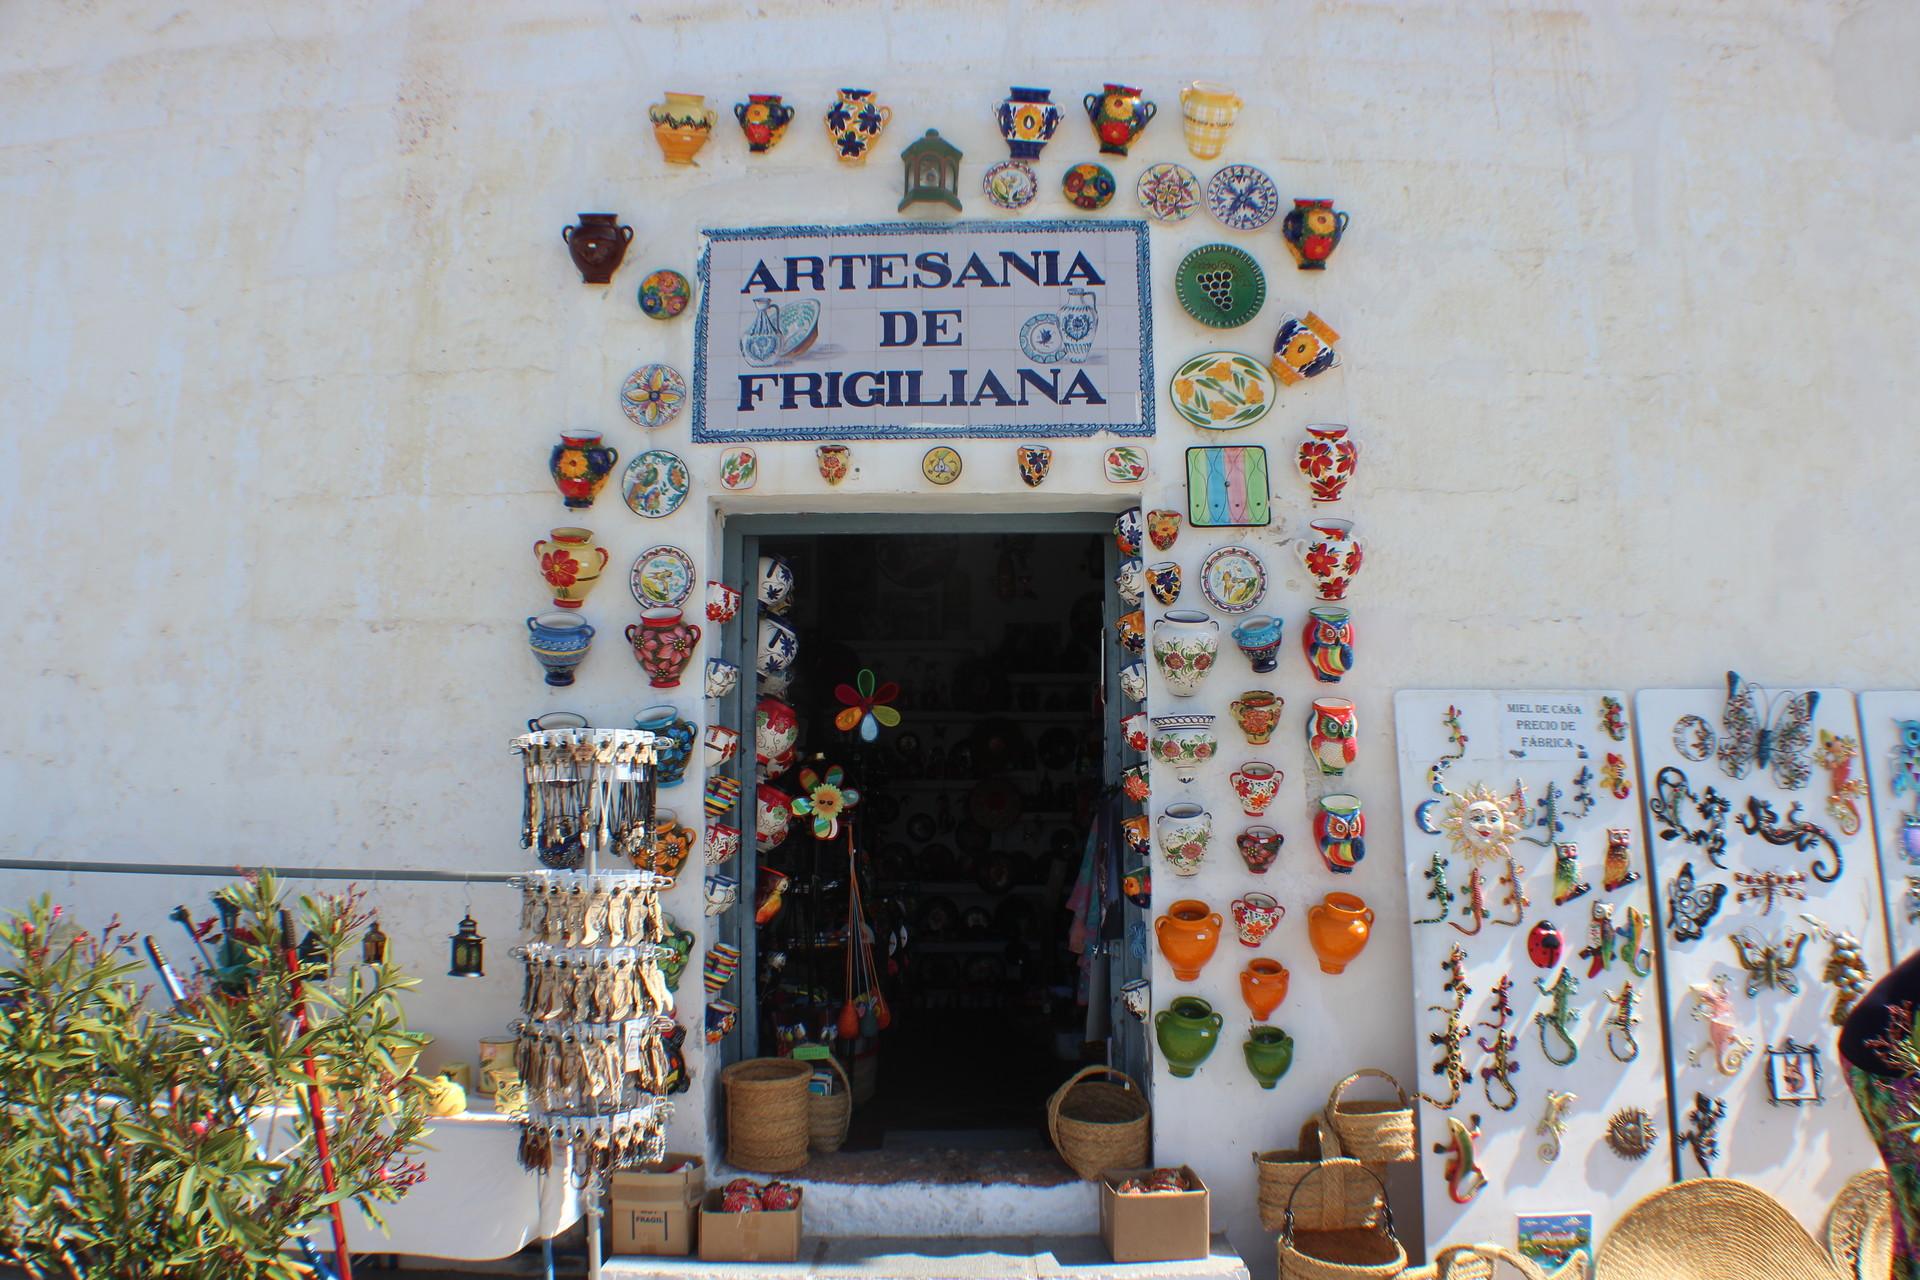 frigiliana-pueblo-blanco-malaga-7aaf00b5